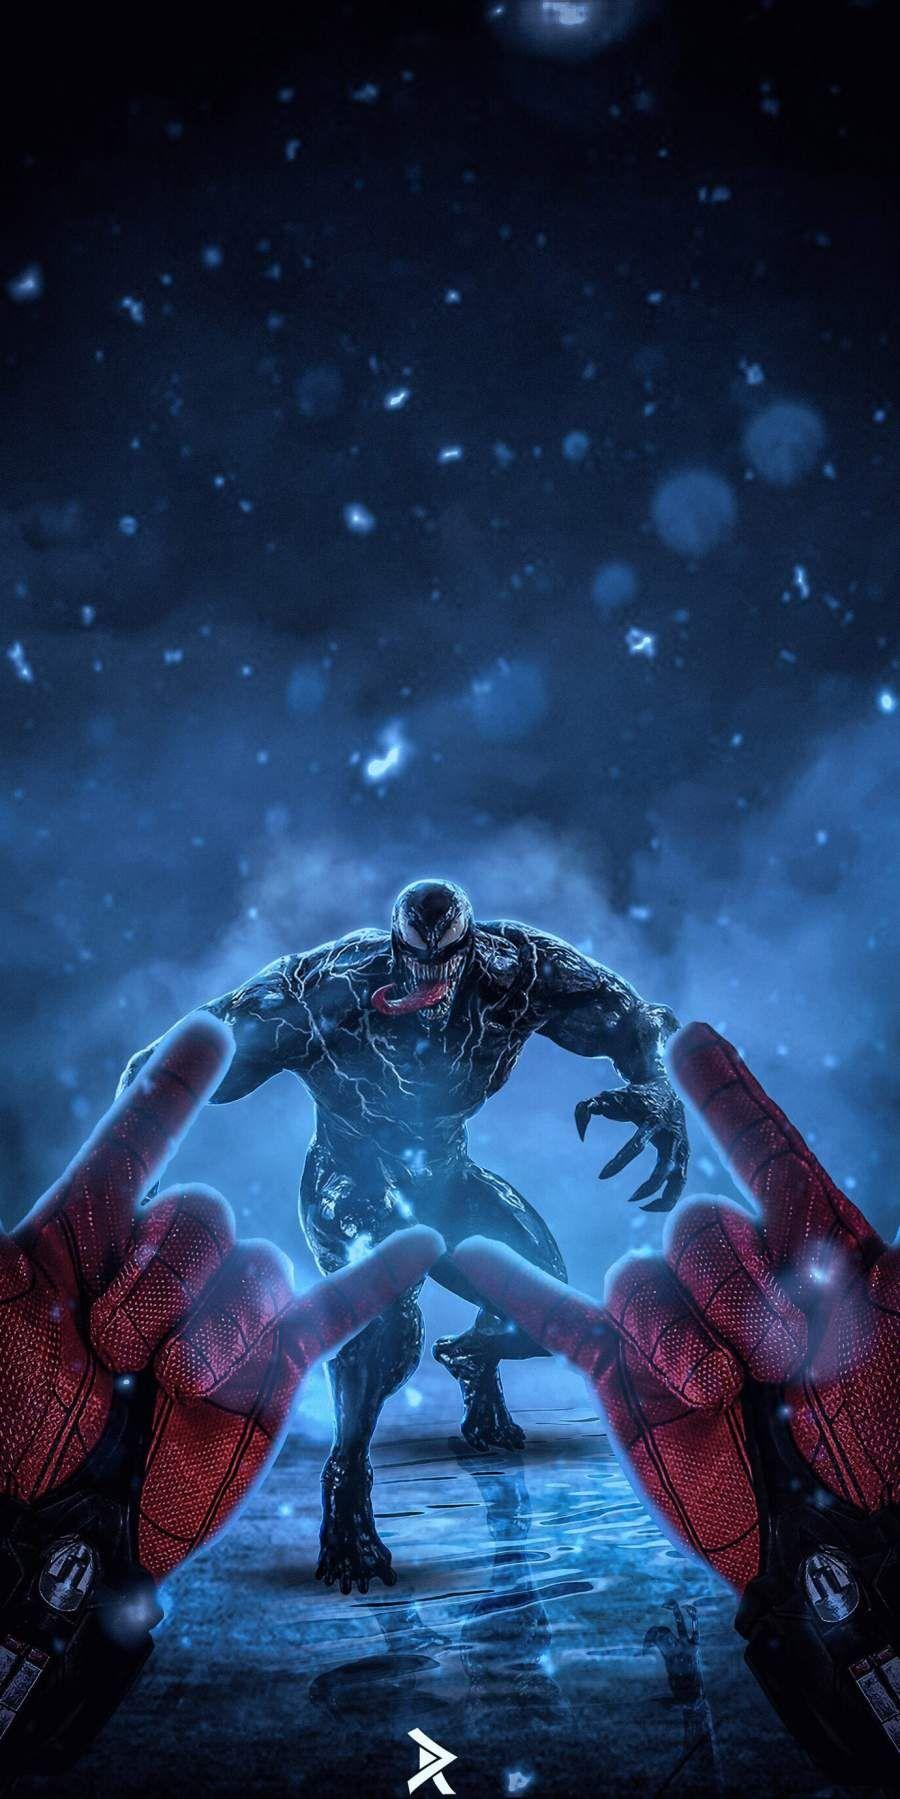 Spidey Vs Venom Ready Attack Iphone Wallpaper Personajes De Graffiti Trajes De Spiderman Imagenes De Venom